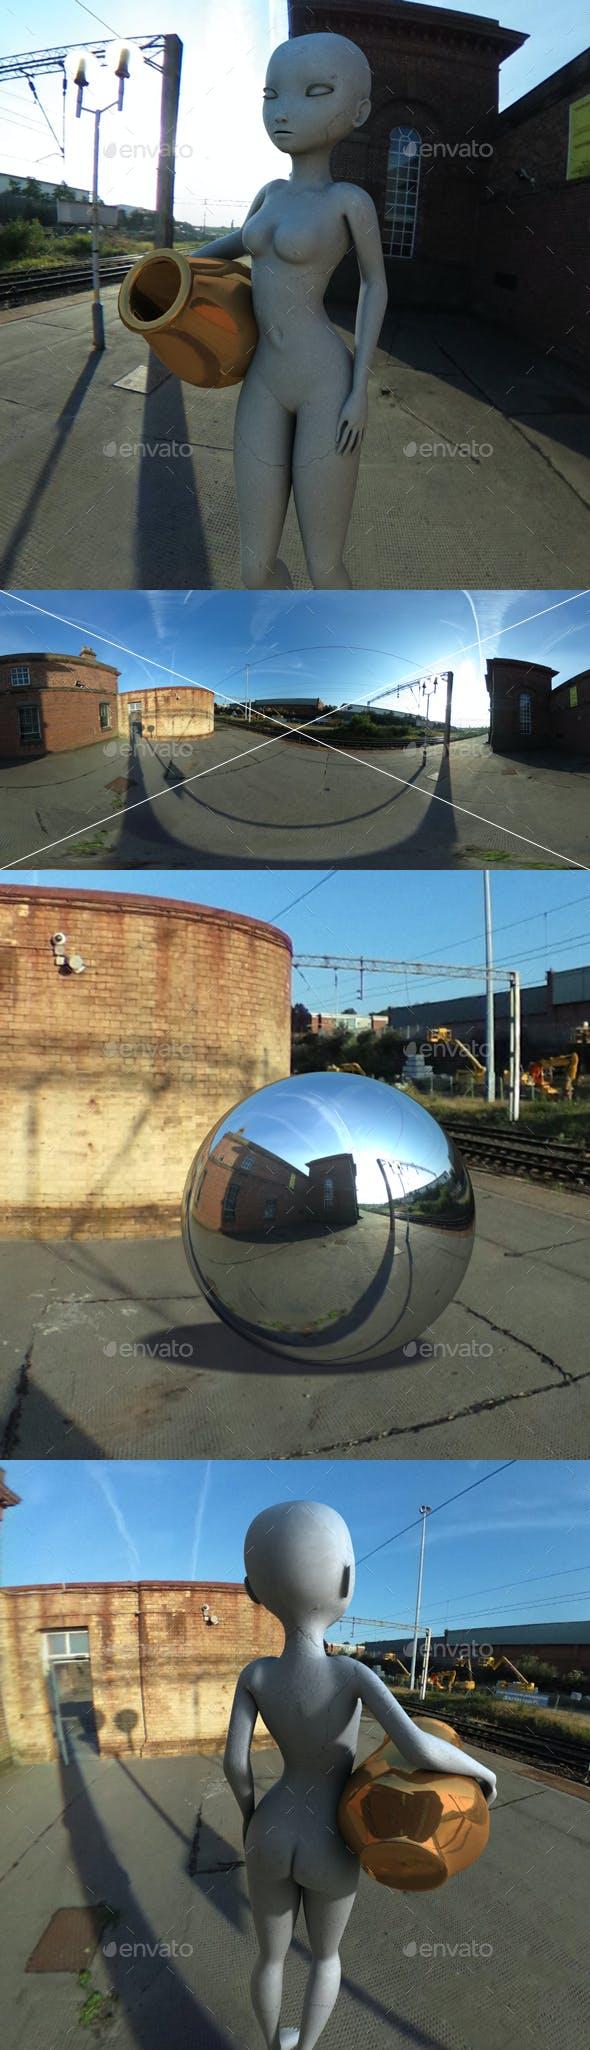 Morning UK Train Station HDRI - 3DOcean Item for Sale